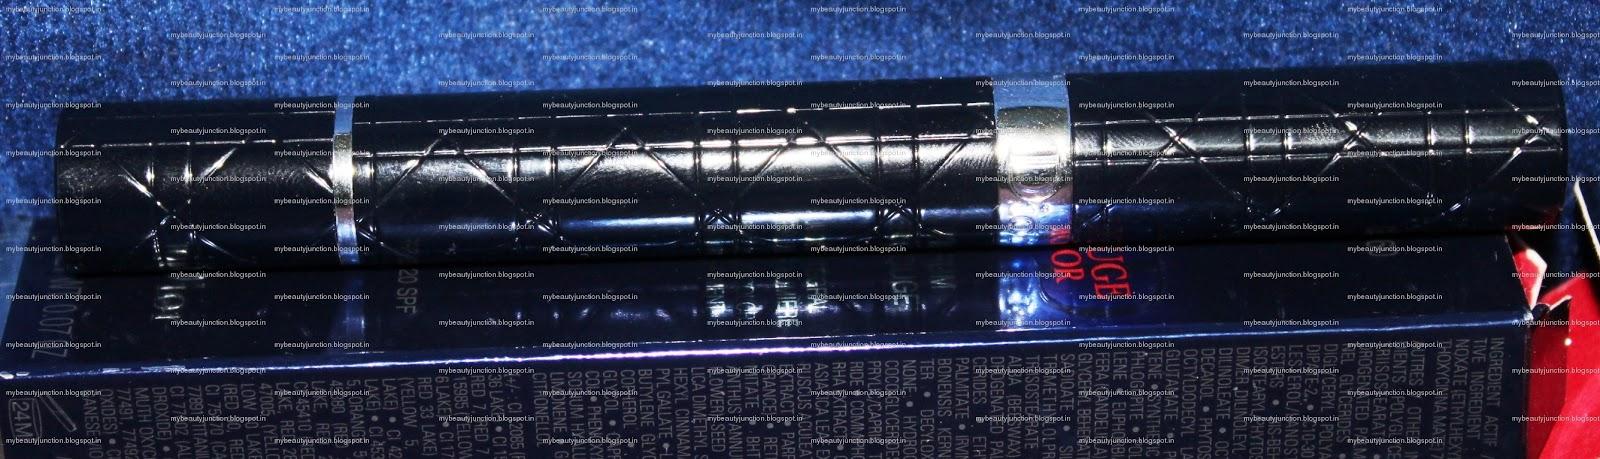 Dior Addict Extreme, Diorific, Serum de Rouge lipstick swatches, review, photos